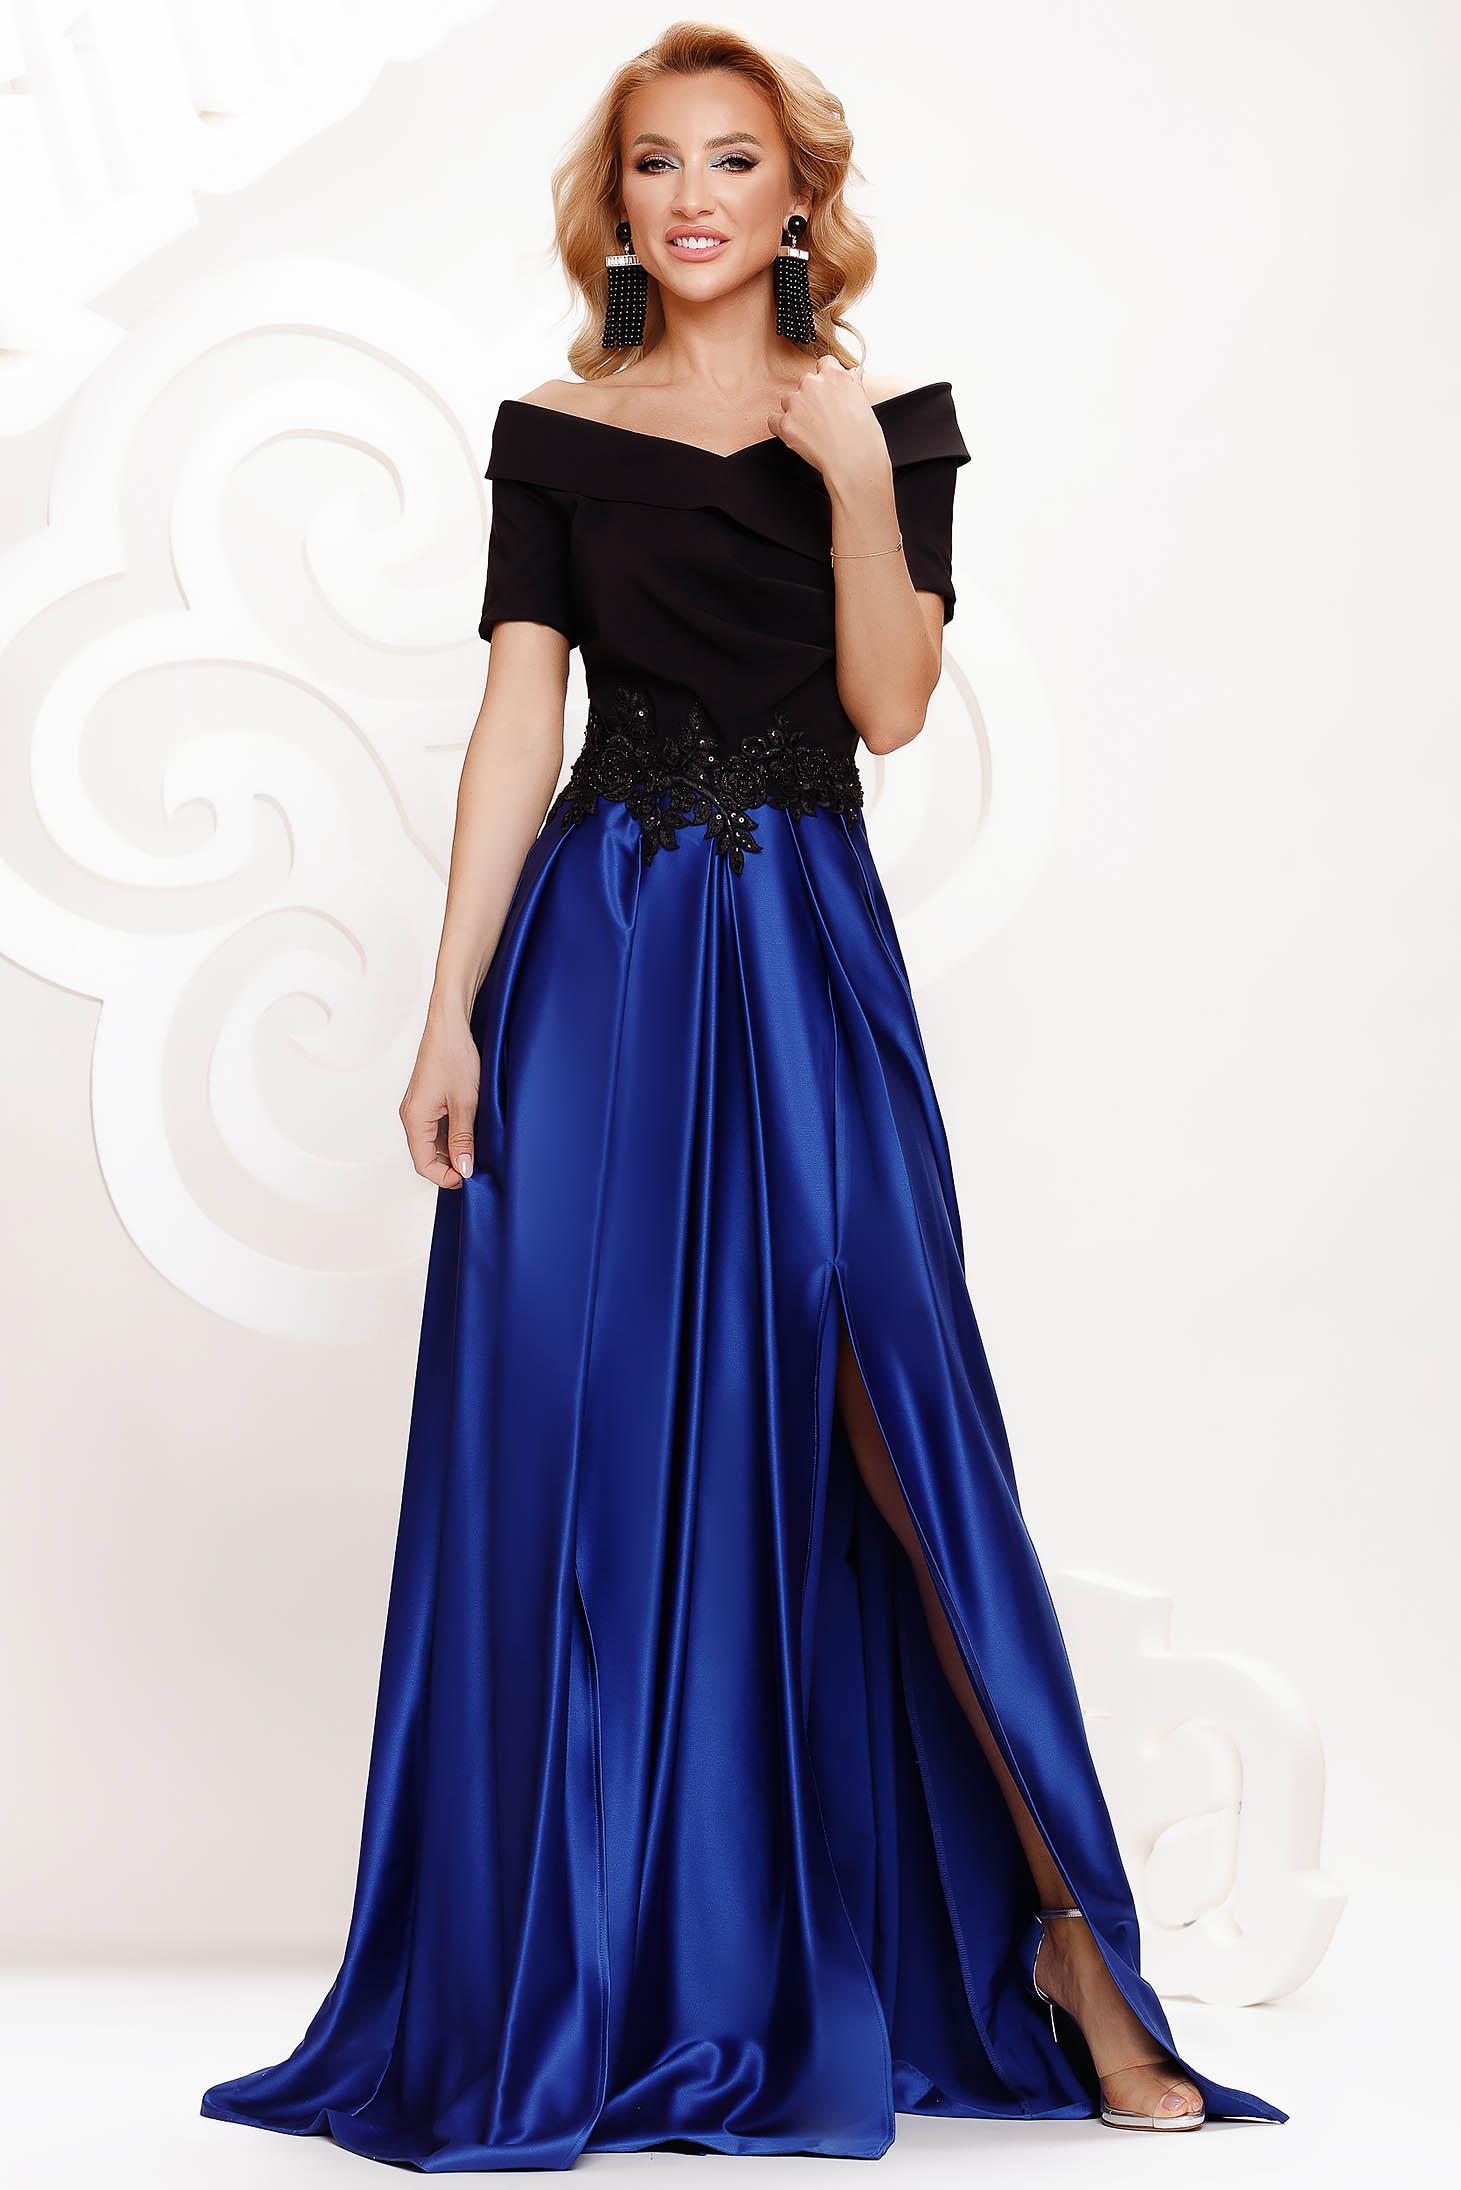 Rochie Artista albastra din satin de ocazie in clos crapata pe picior pe umeri accesorizata cu pietre stras